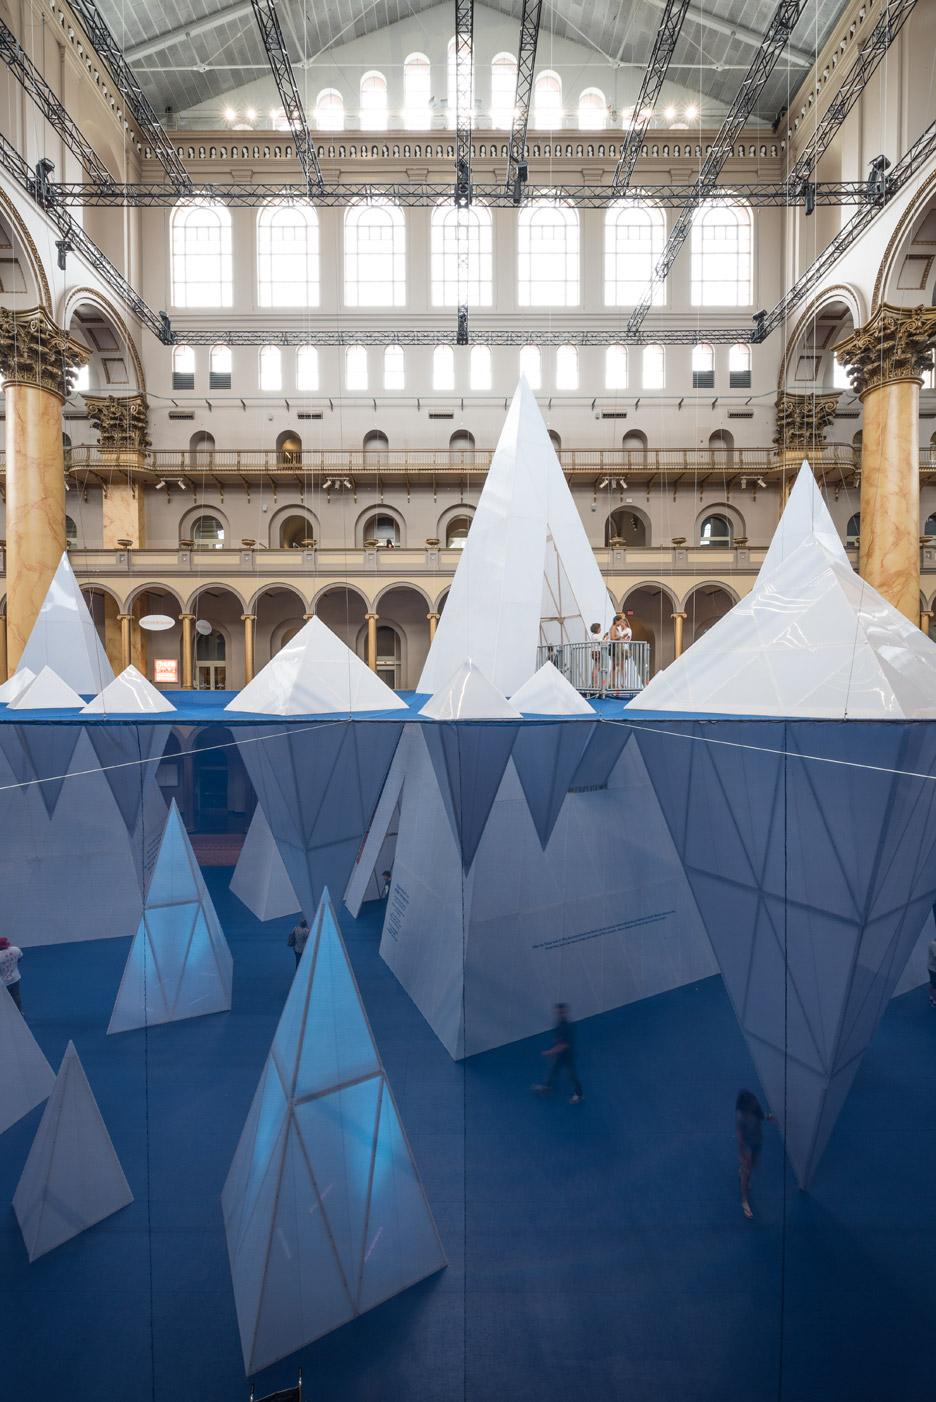 Icebergs by James Corner